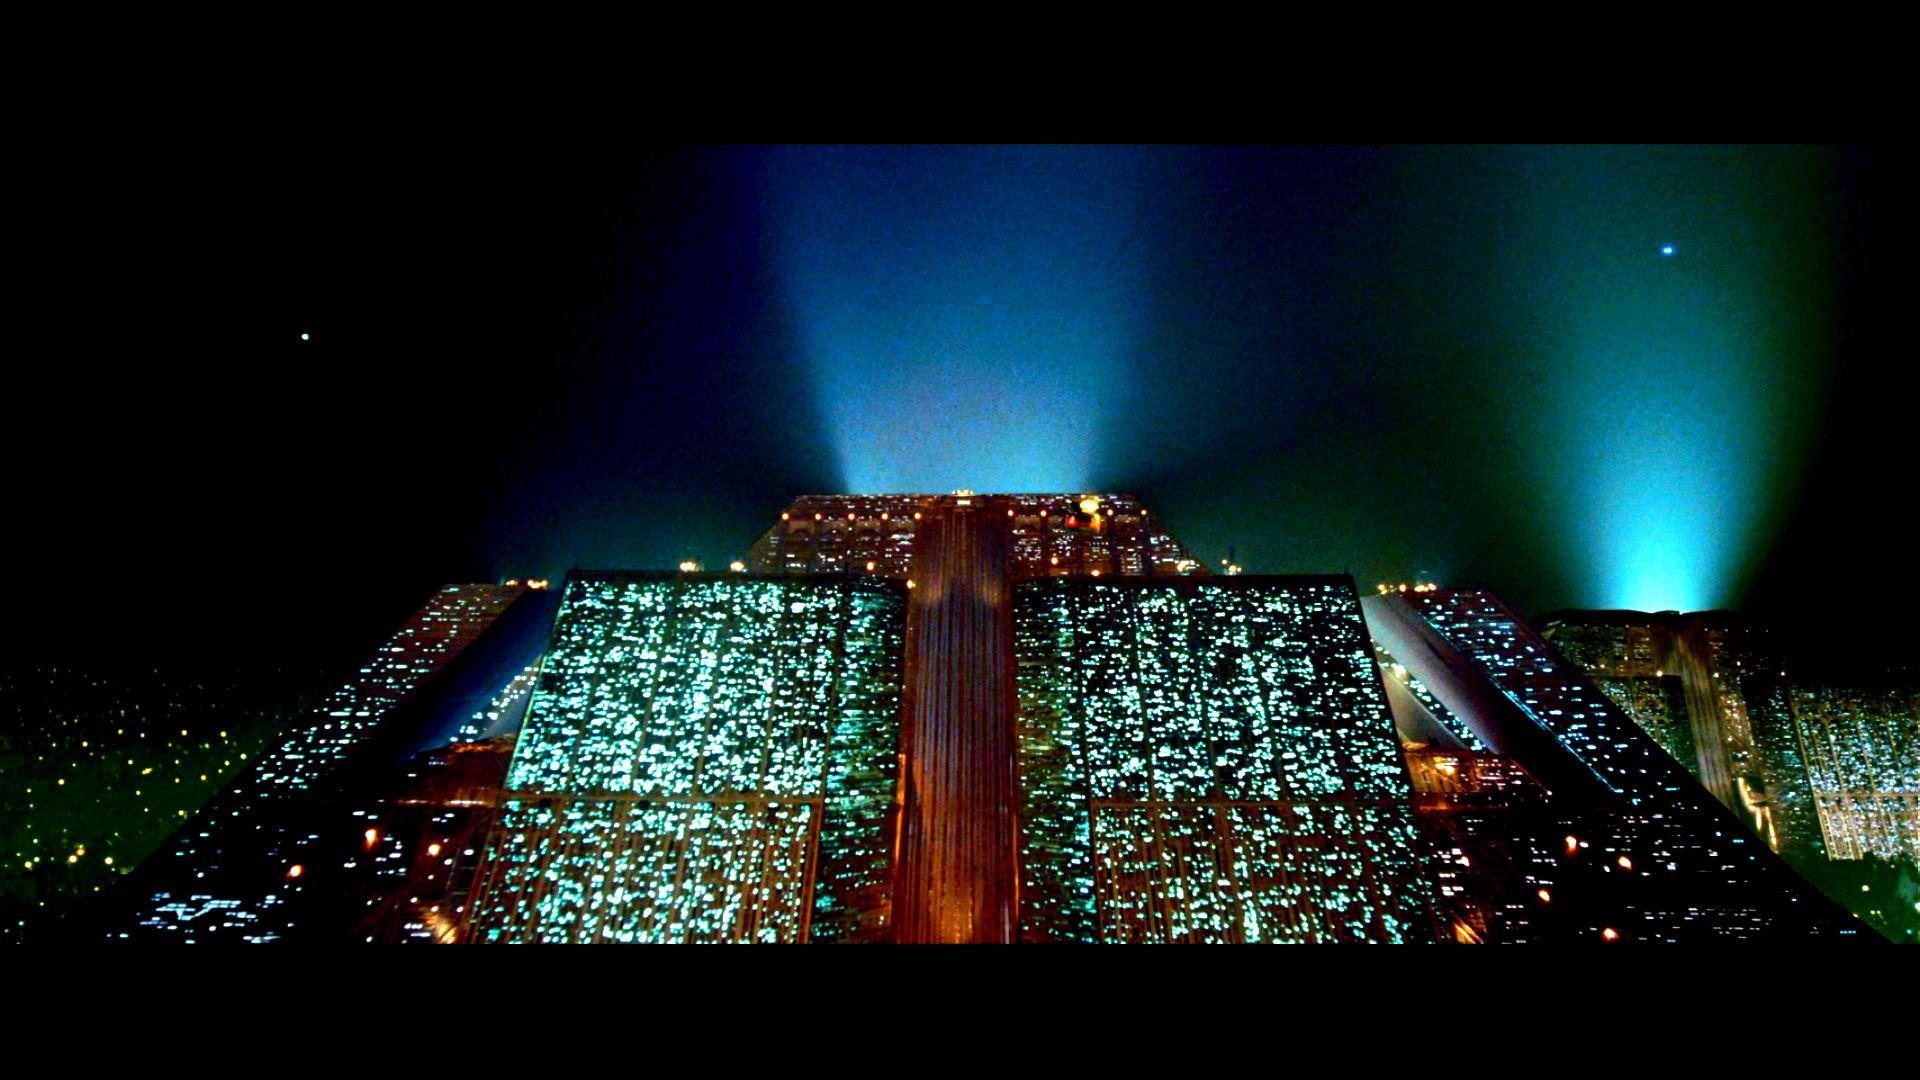 Blade Runner 2049 Wallpaper Iphone X Blade Runner Wallpaper 183 ① Download Free Full Hd